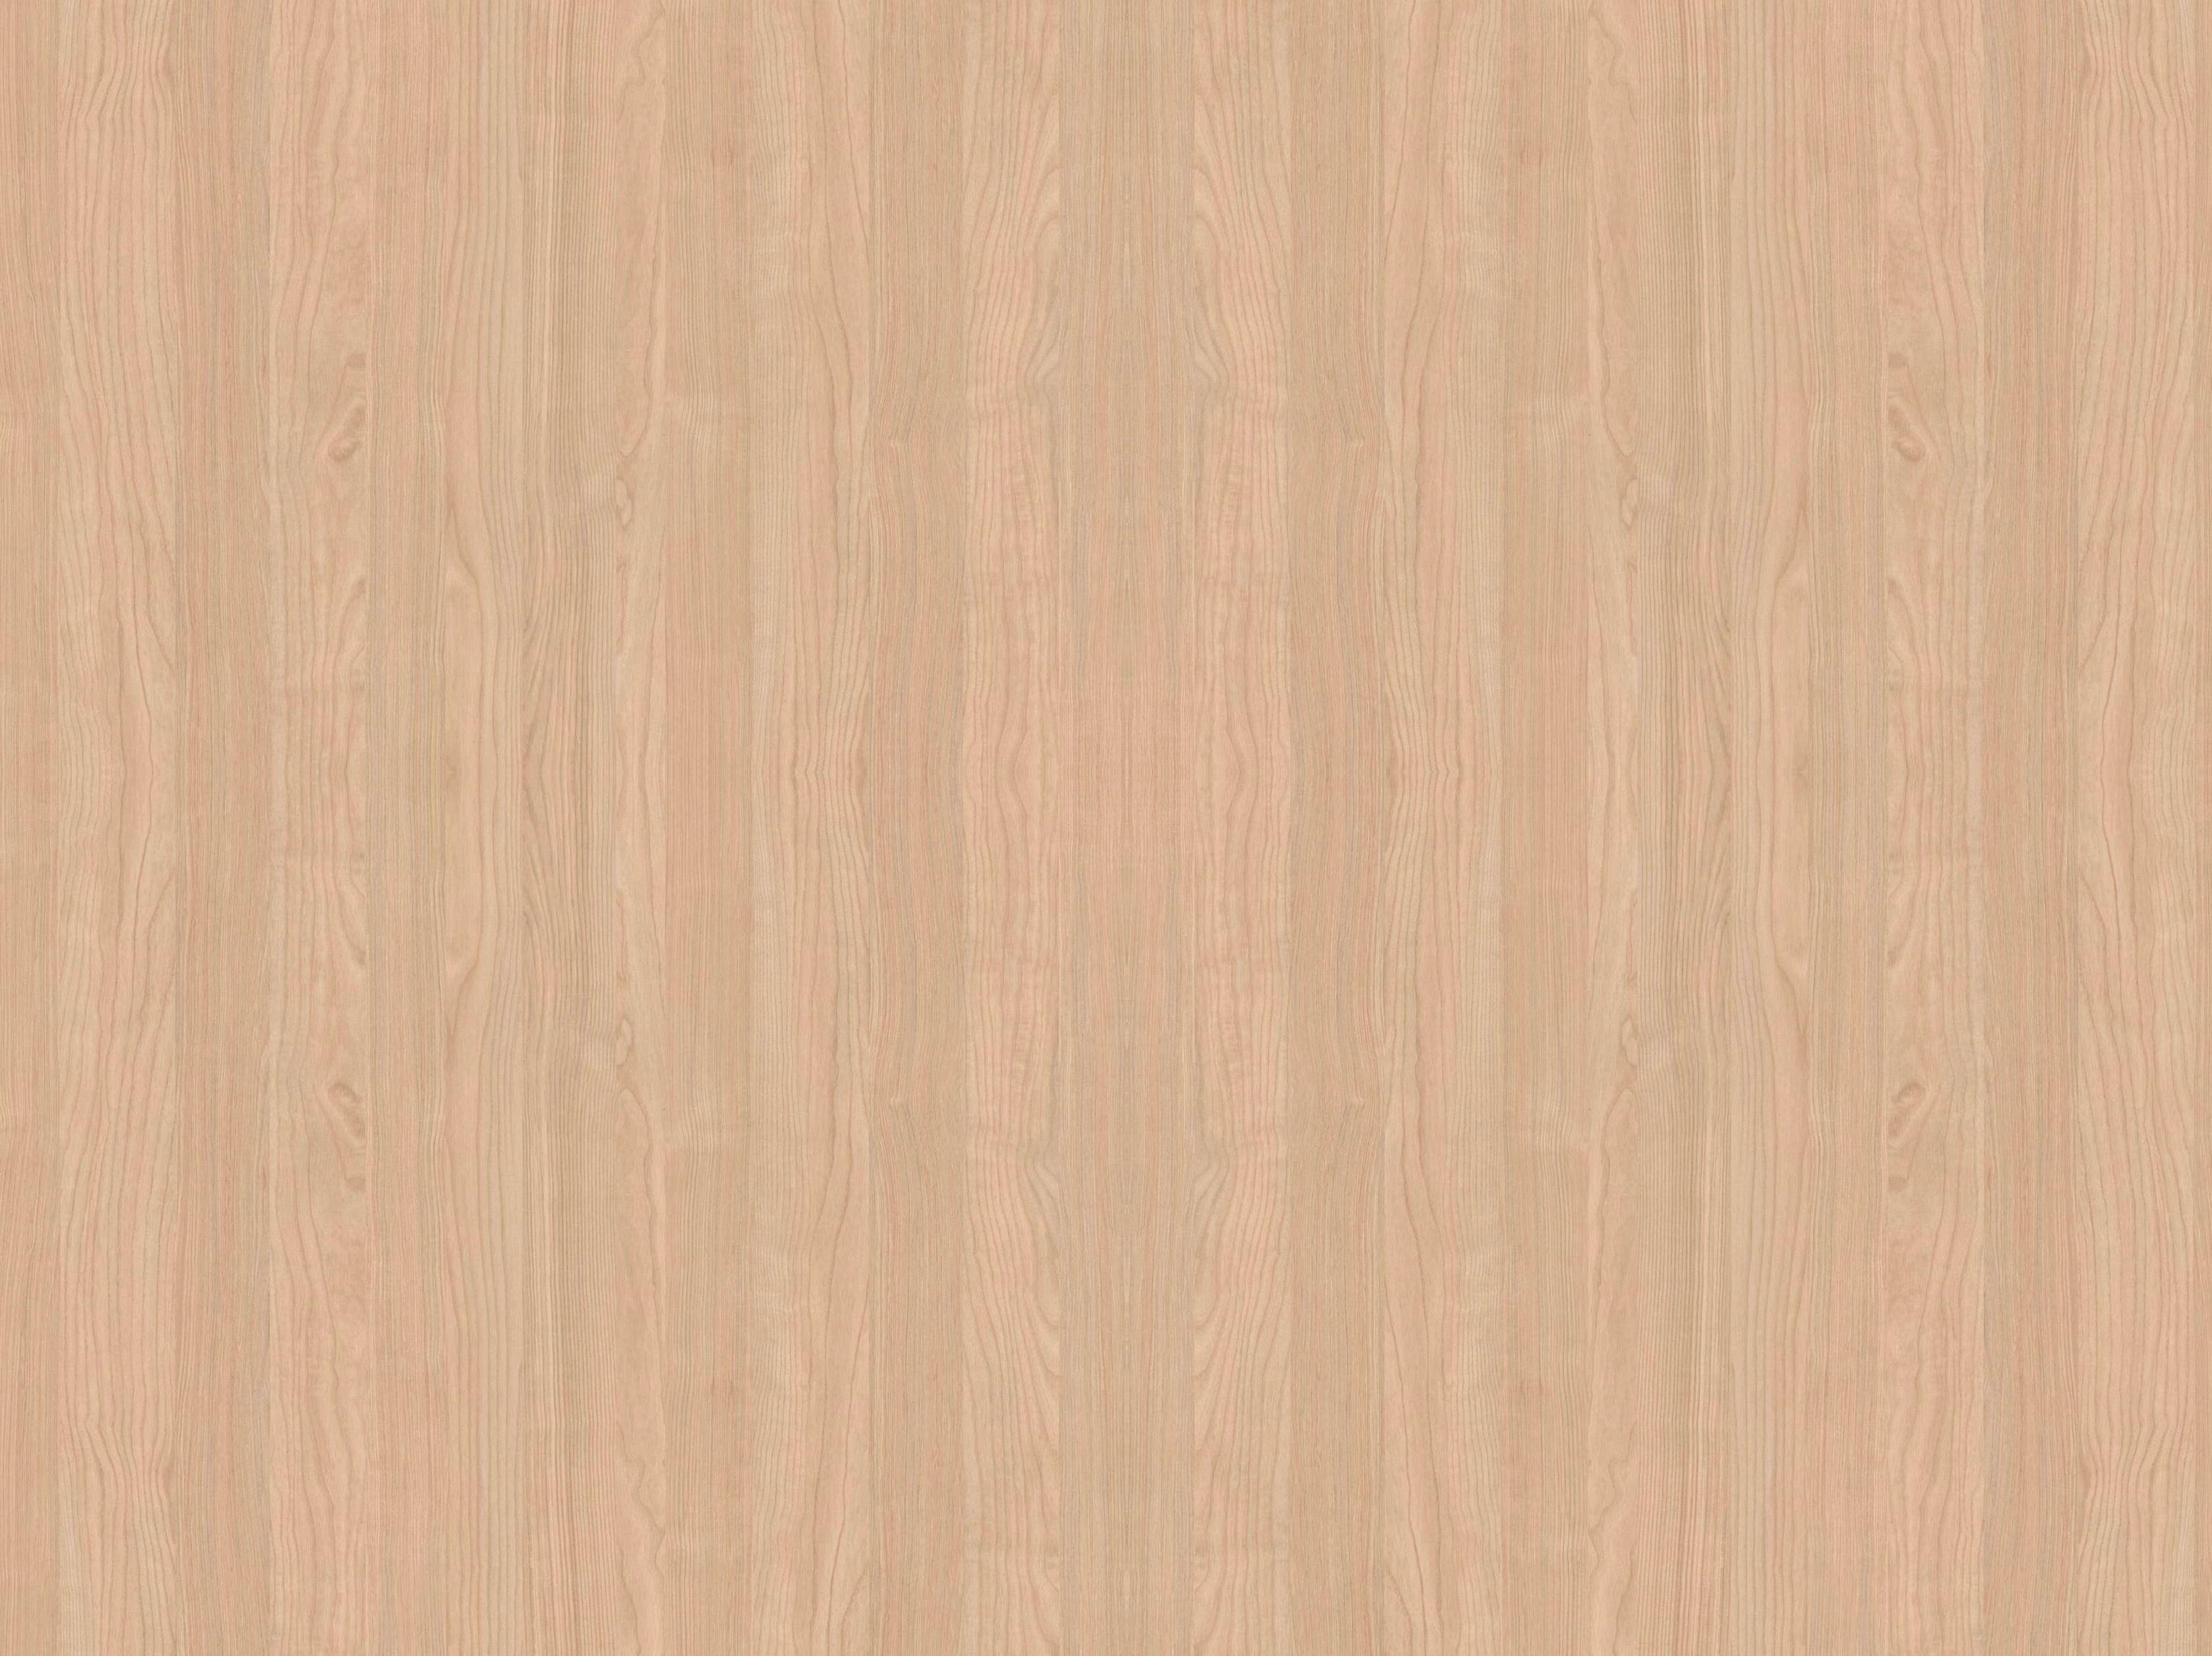 discover textures | Birch Helsinki Wood Texturediscover textures